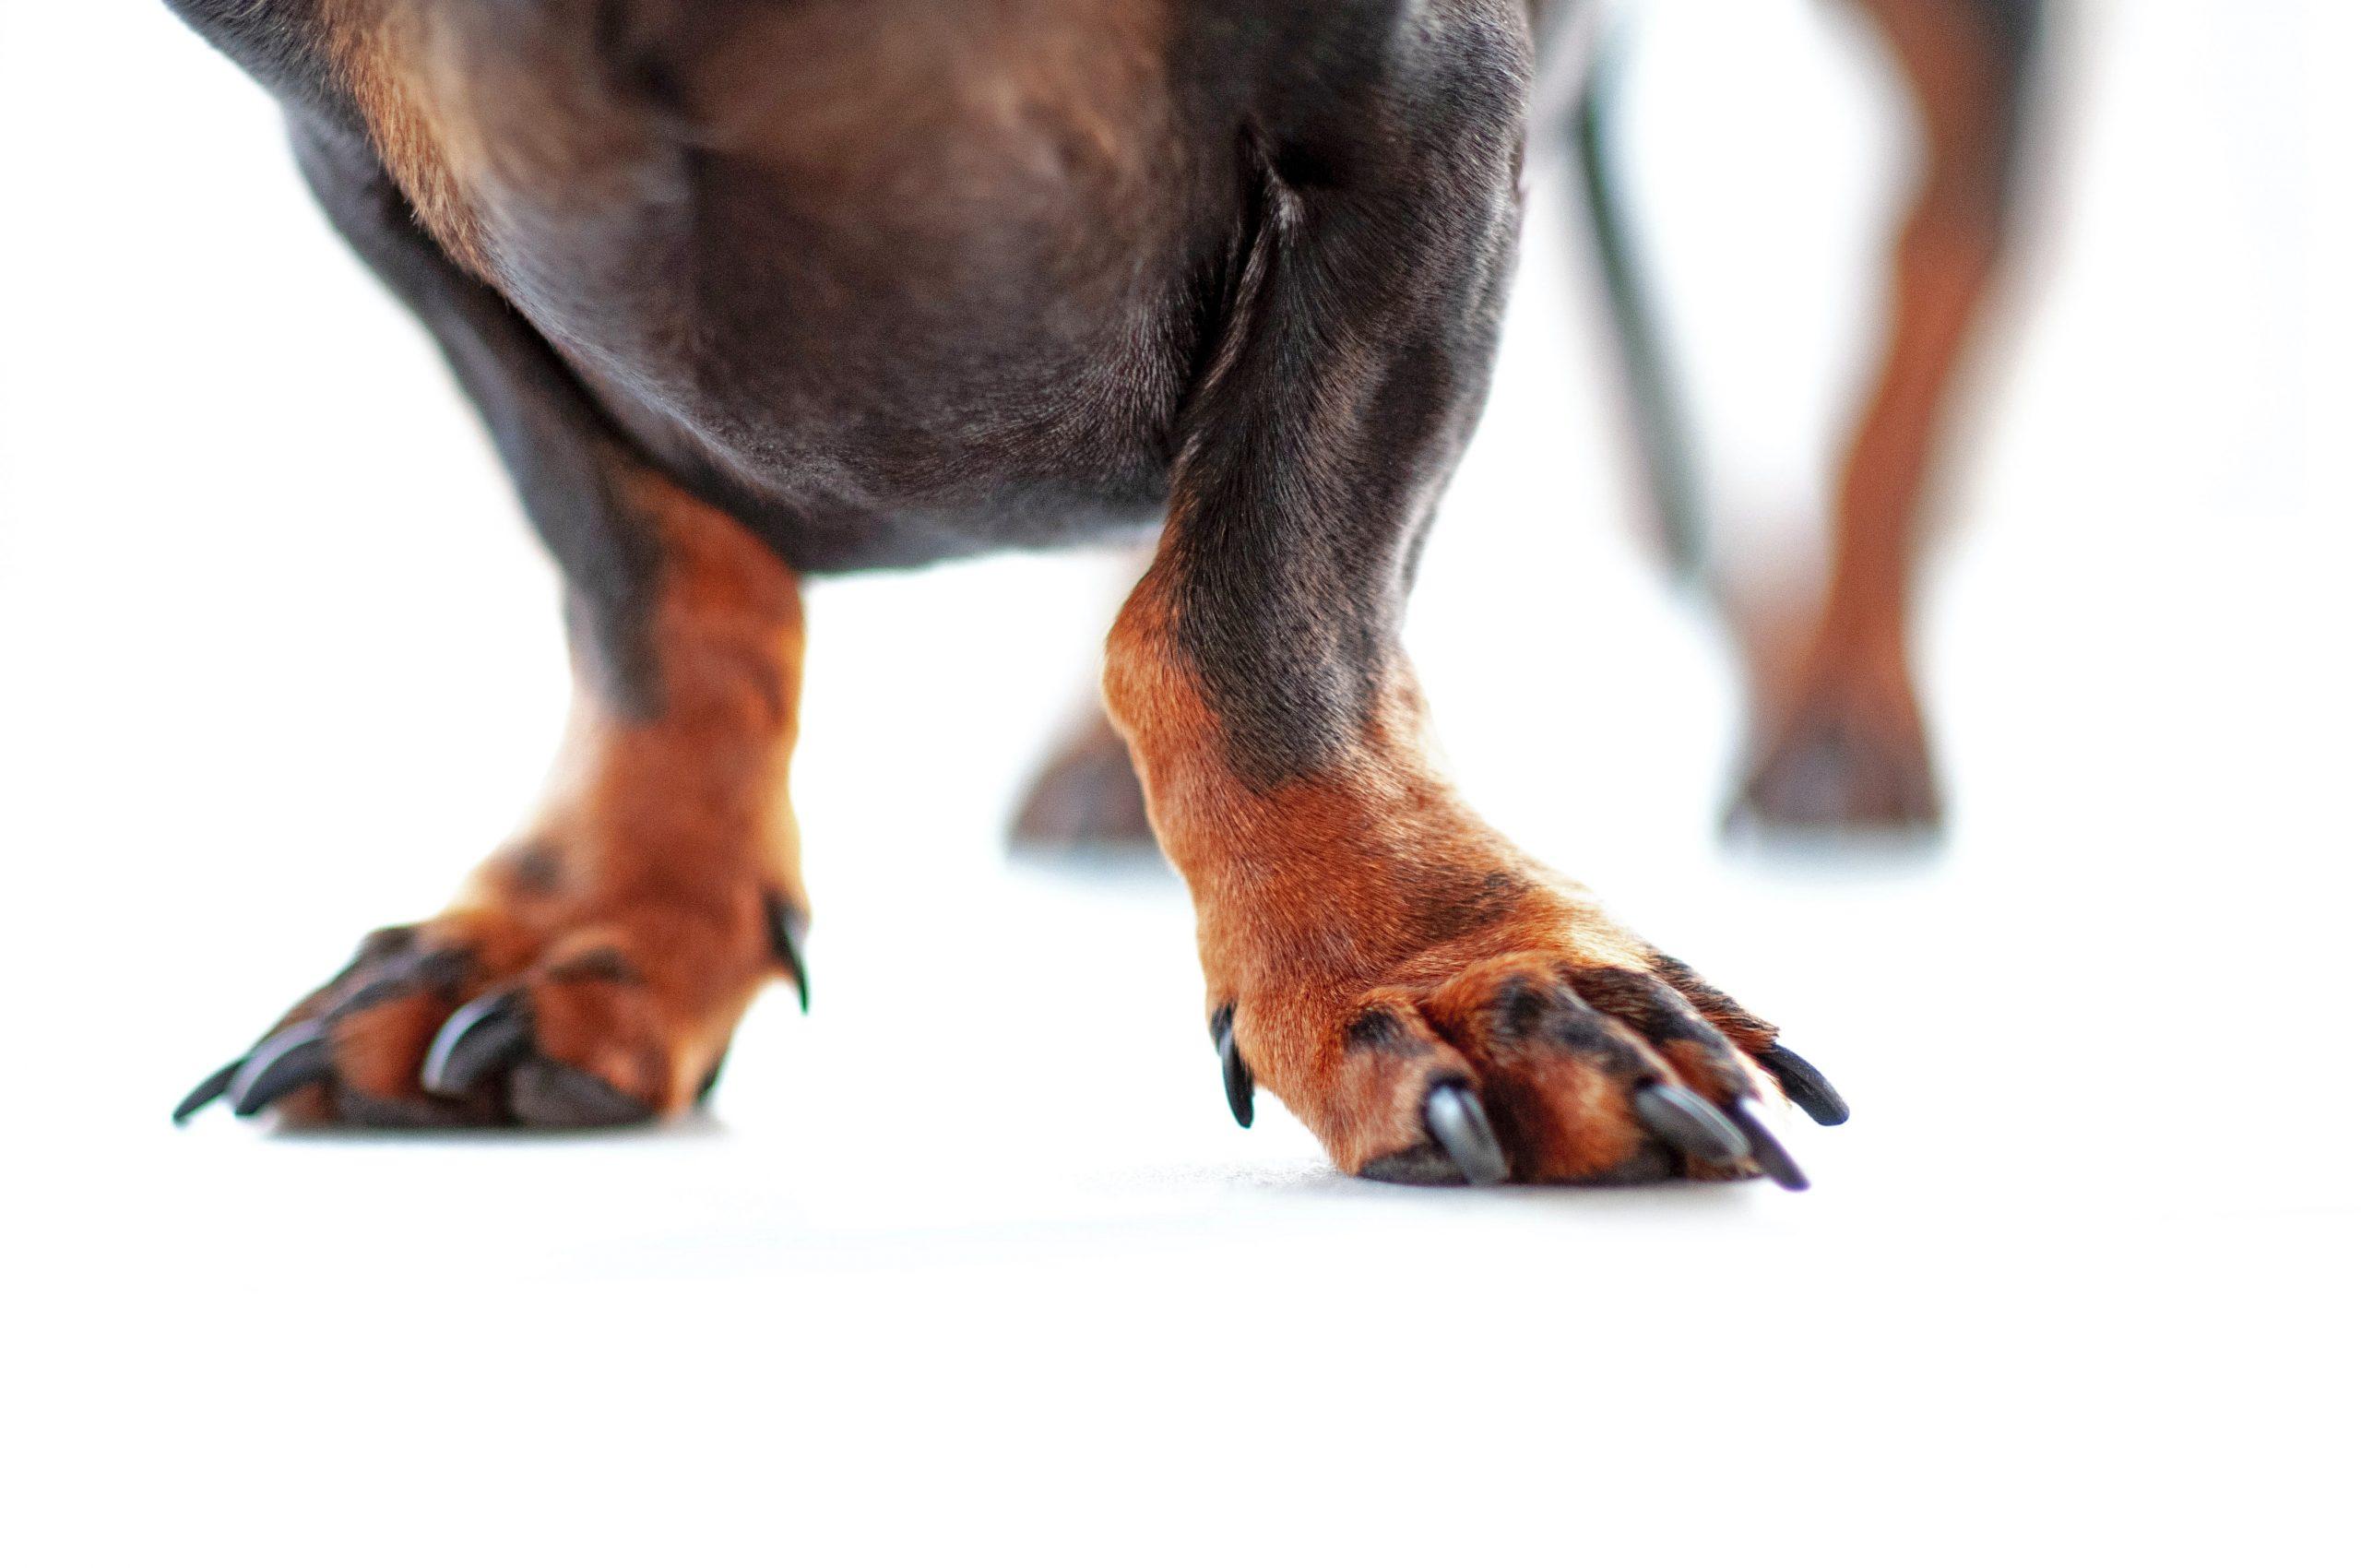 6 Best Non Slip Dog Booties for Indoors - Image by Erda Estremera via Unsplash.